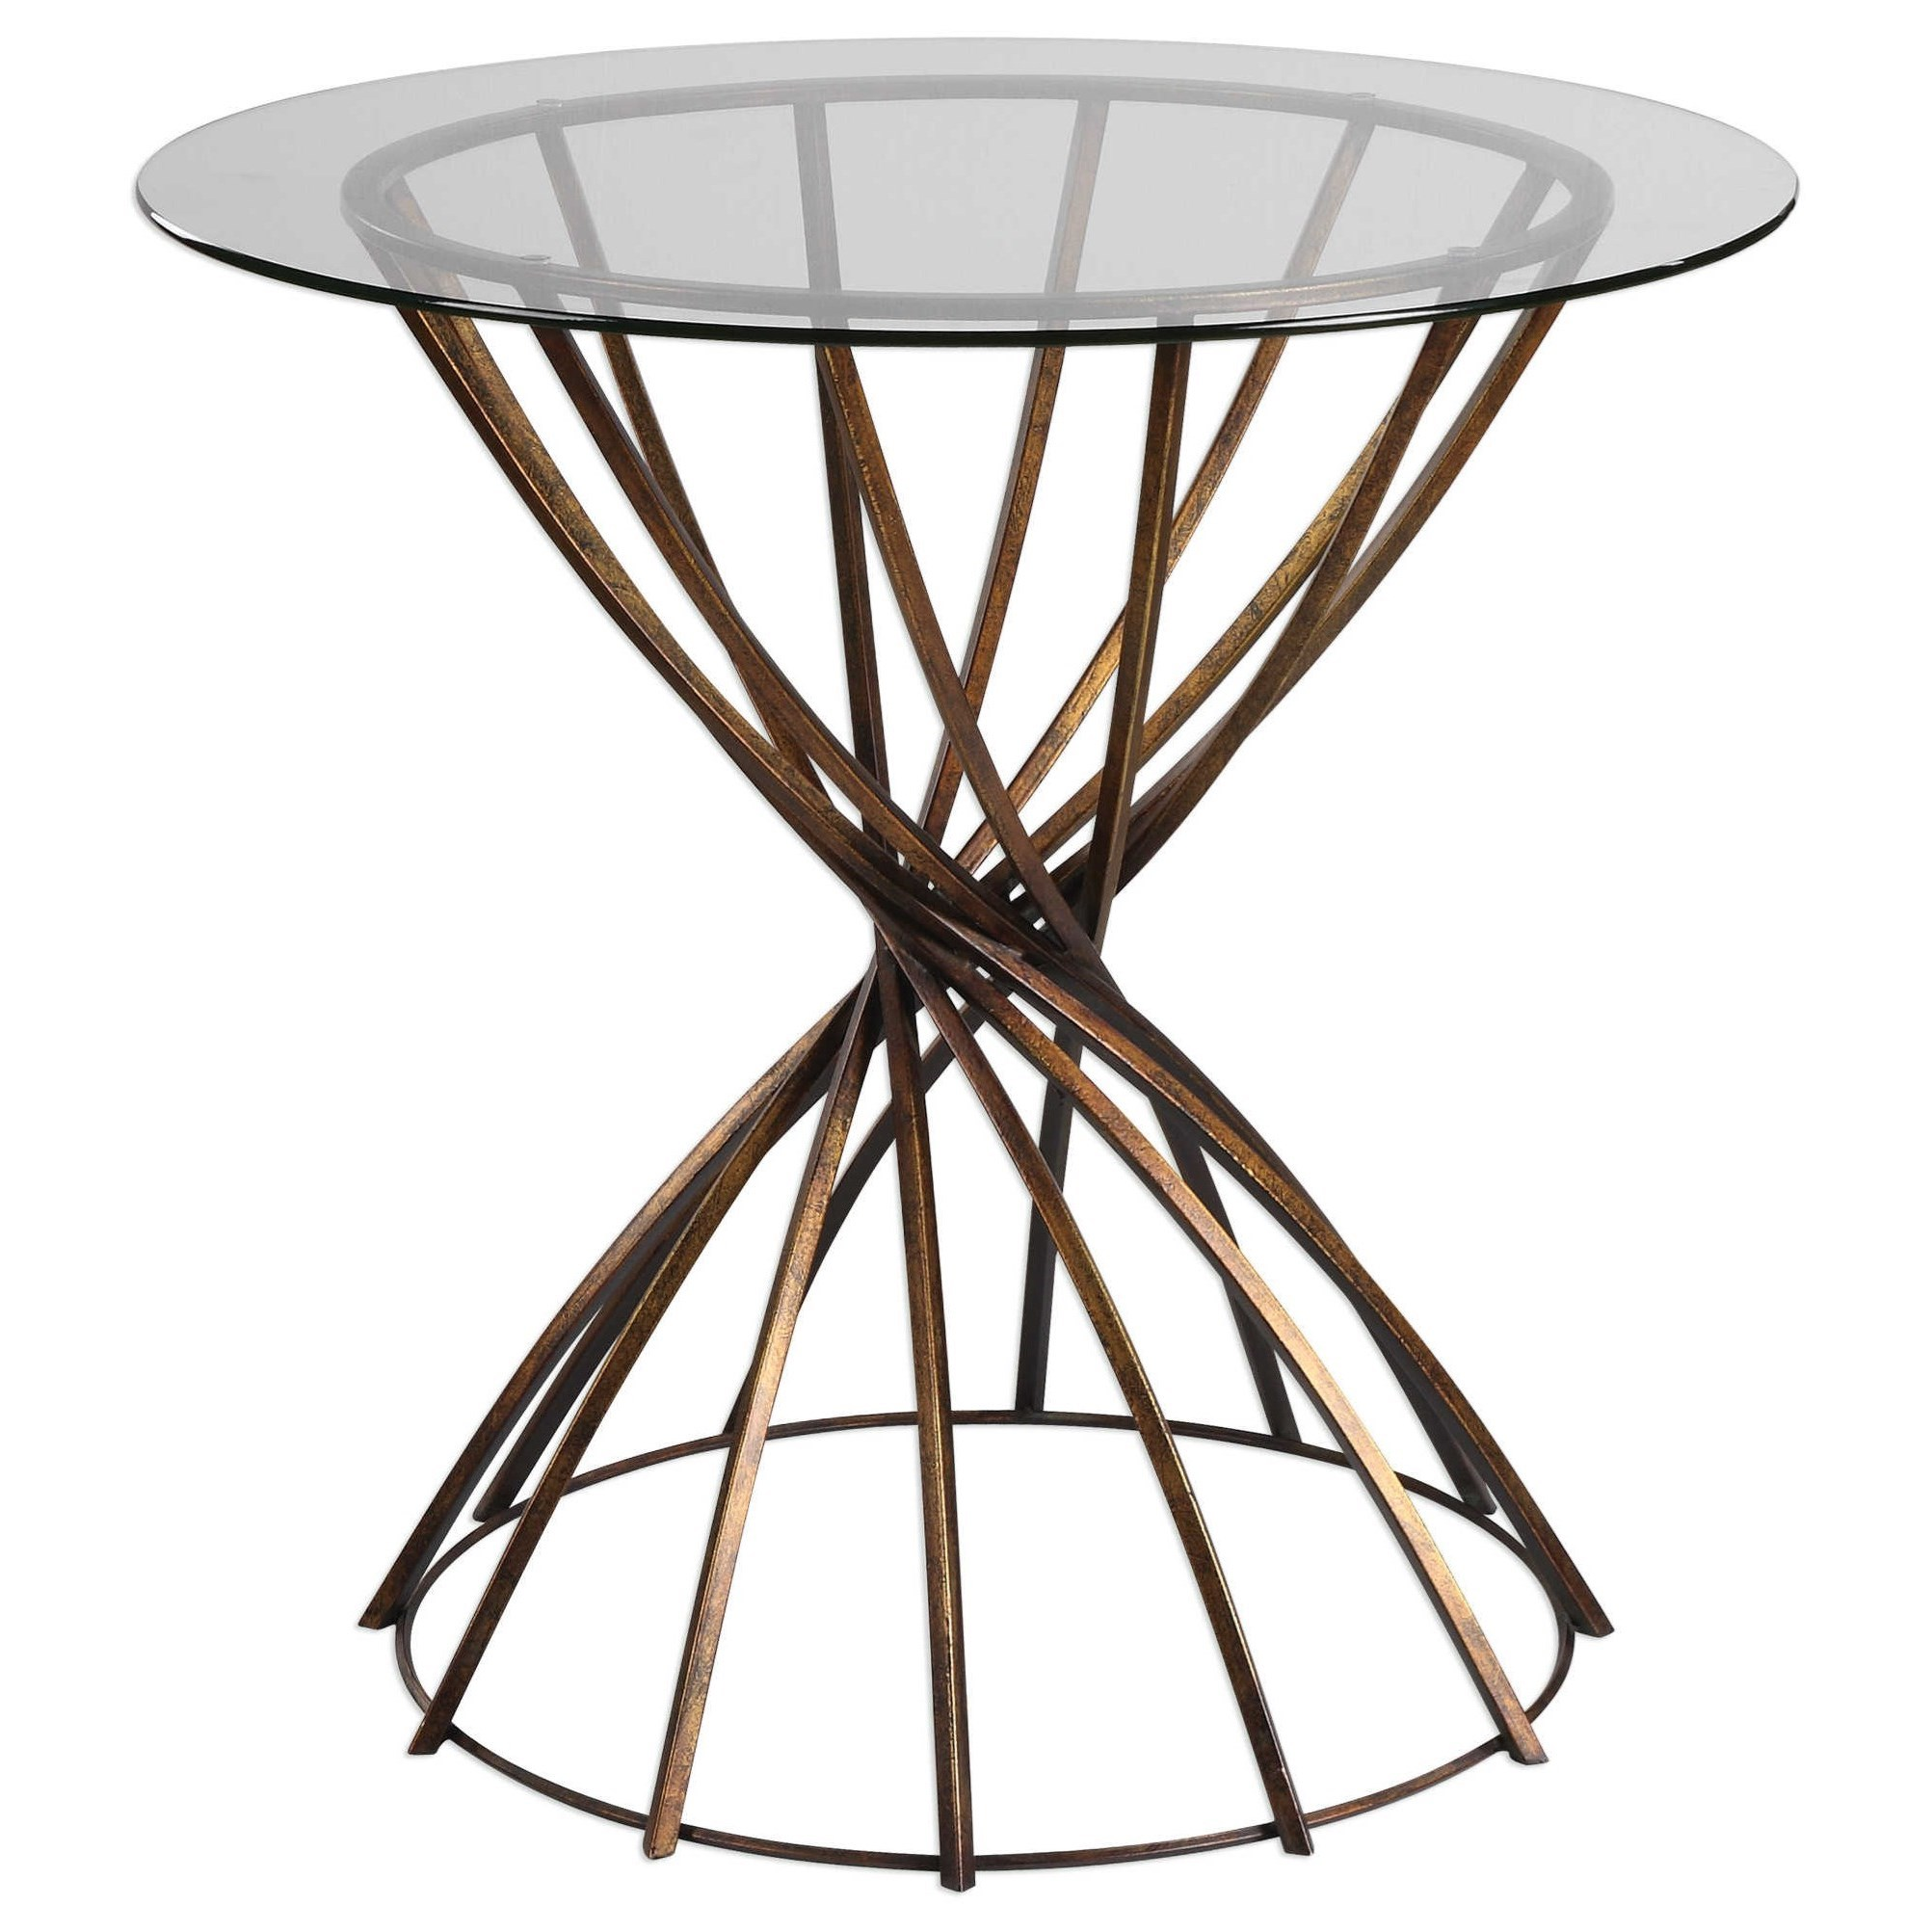 Uttermost Accent Furniture  Yael Antiqued Bronze Accent Table - Item Number: 24702